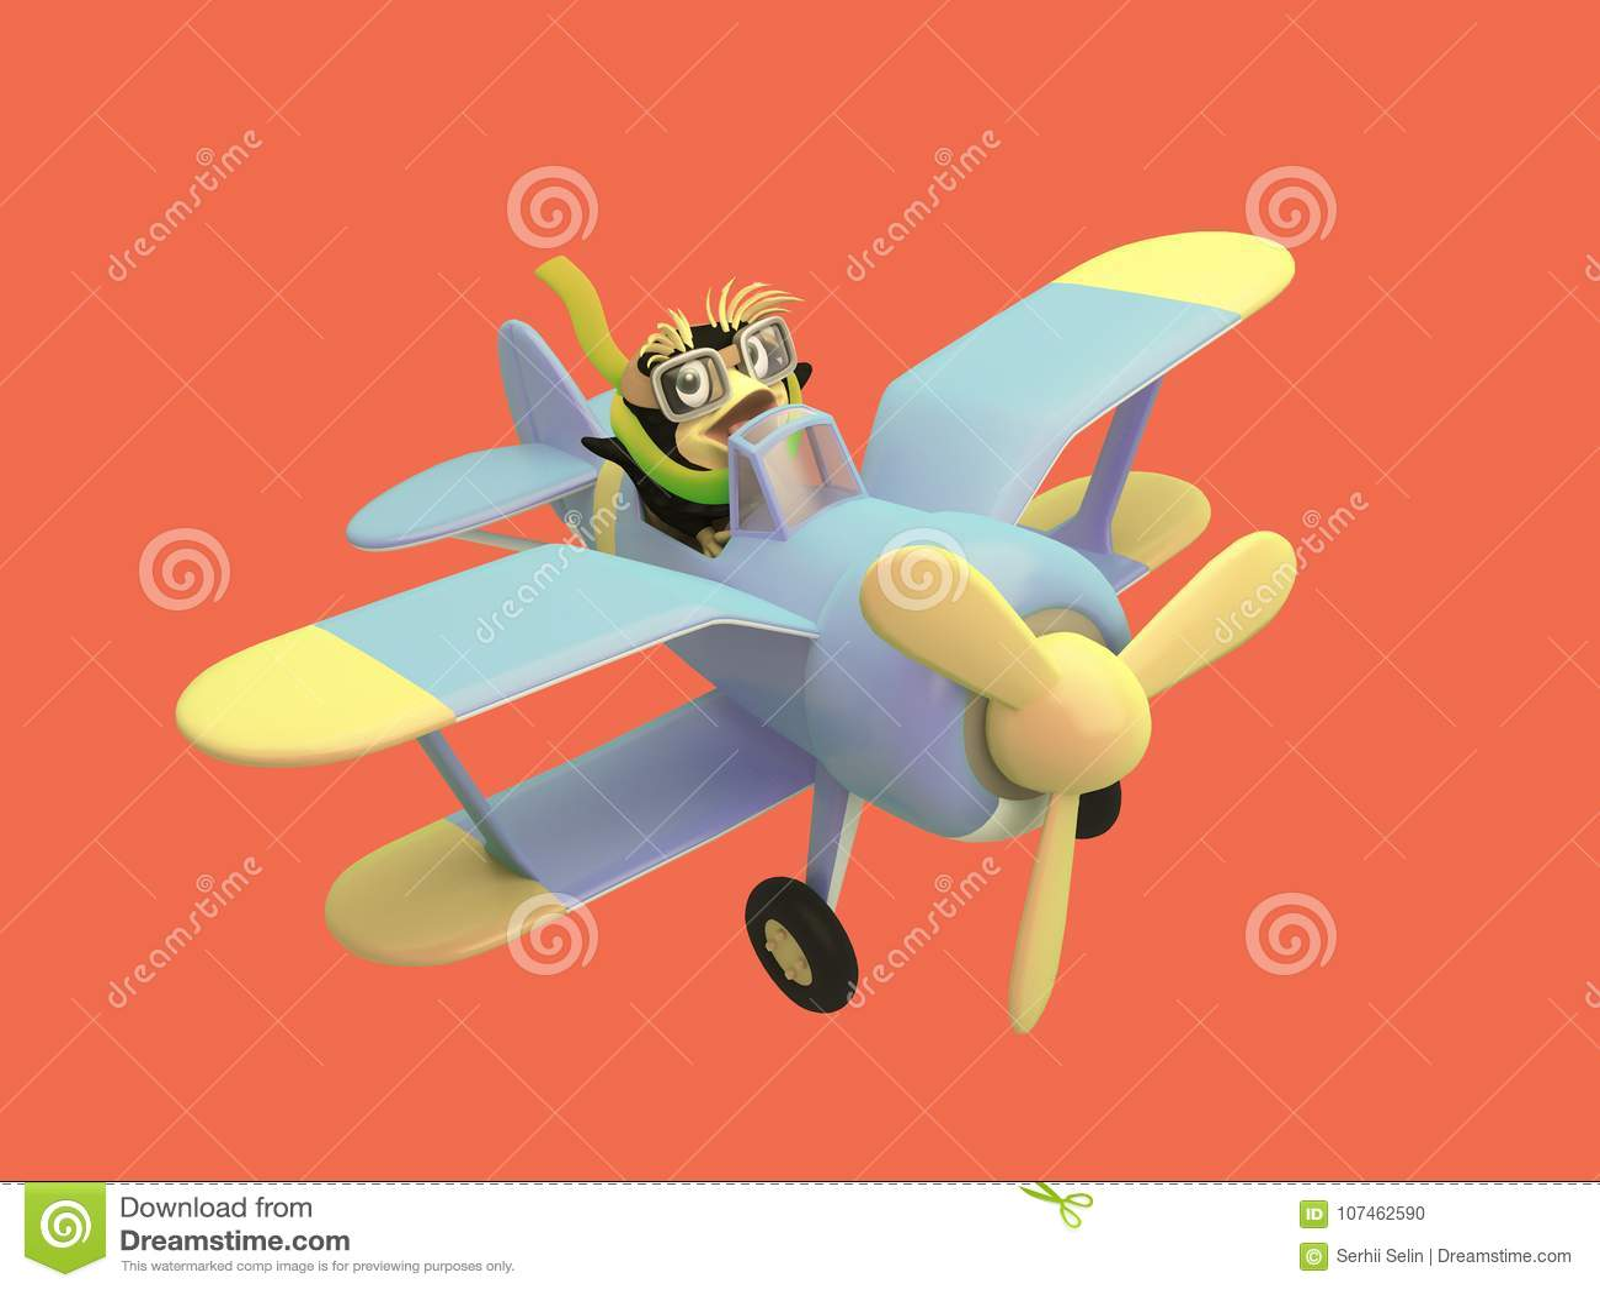 089ccbc6a9 Cartoon pilot penguin controls a funny blue plane. Cute 3d illustration.  Red background